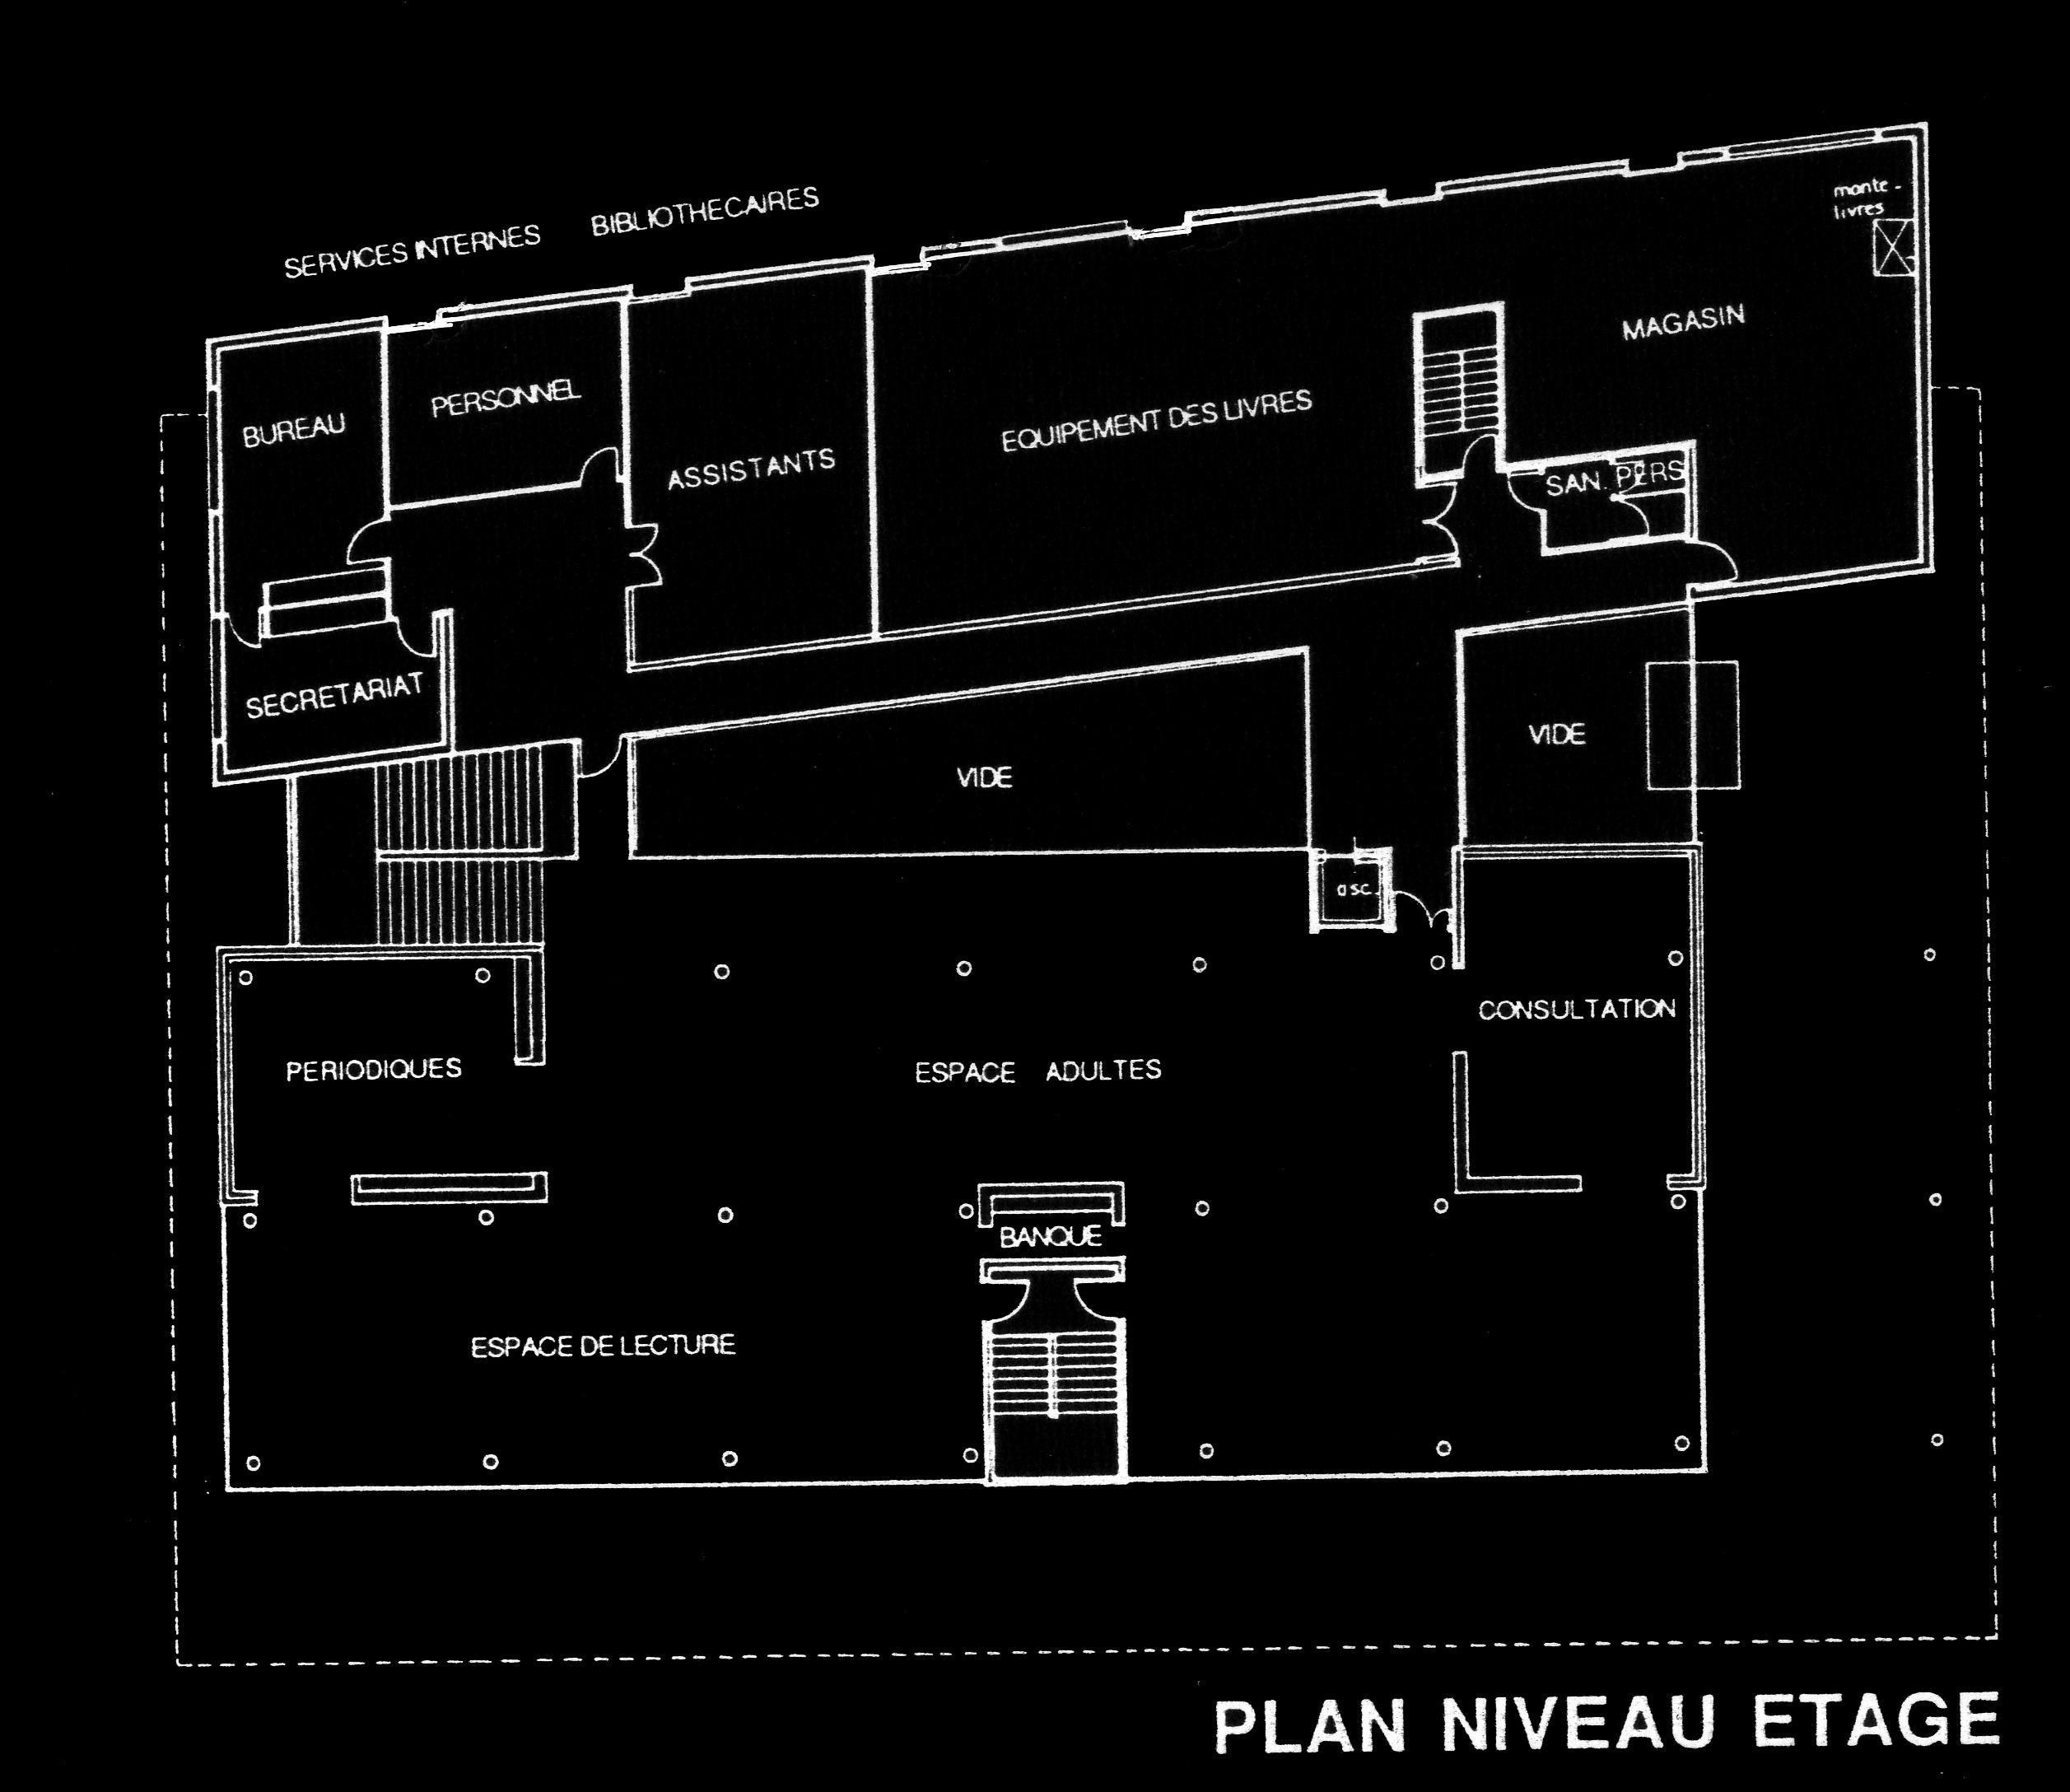 plan etage neg.jpg